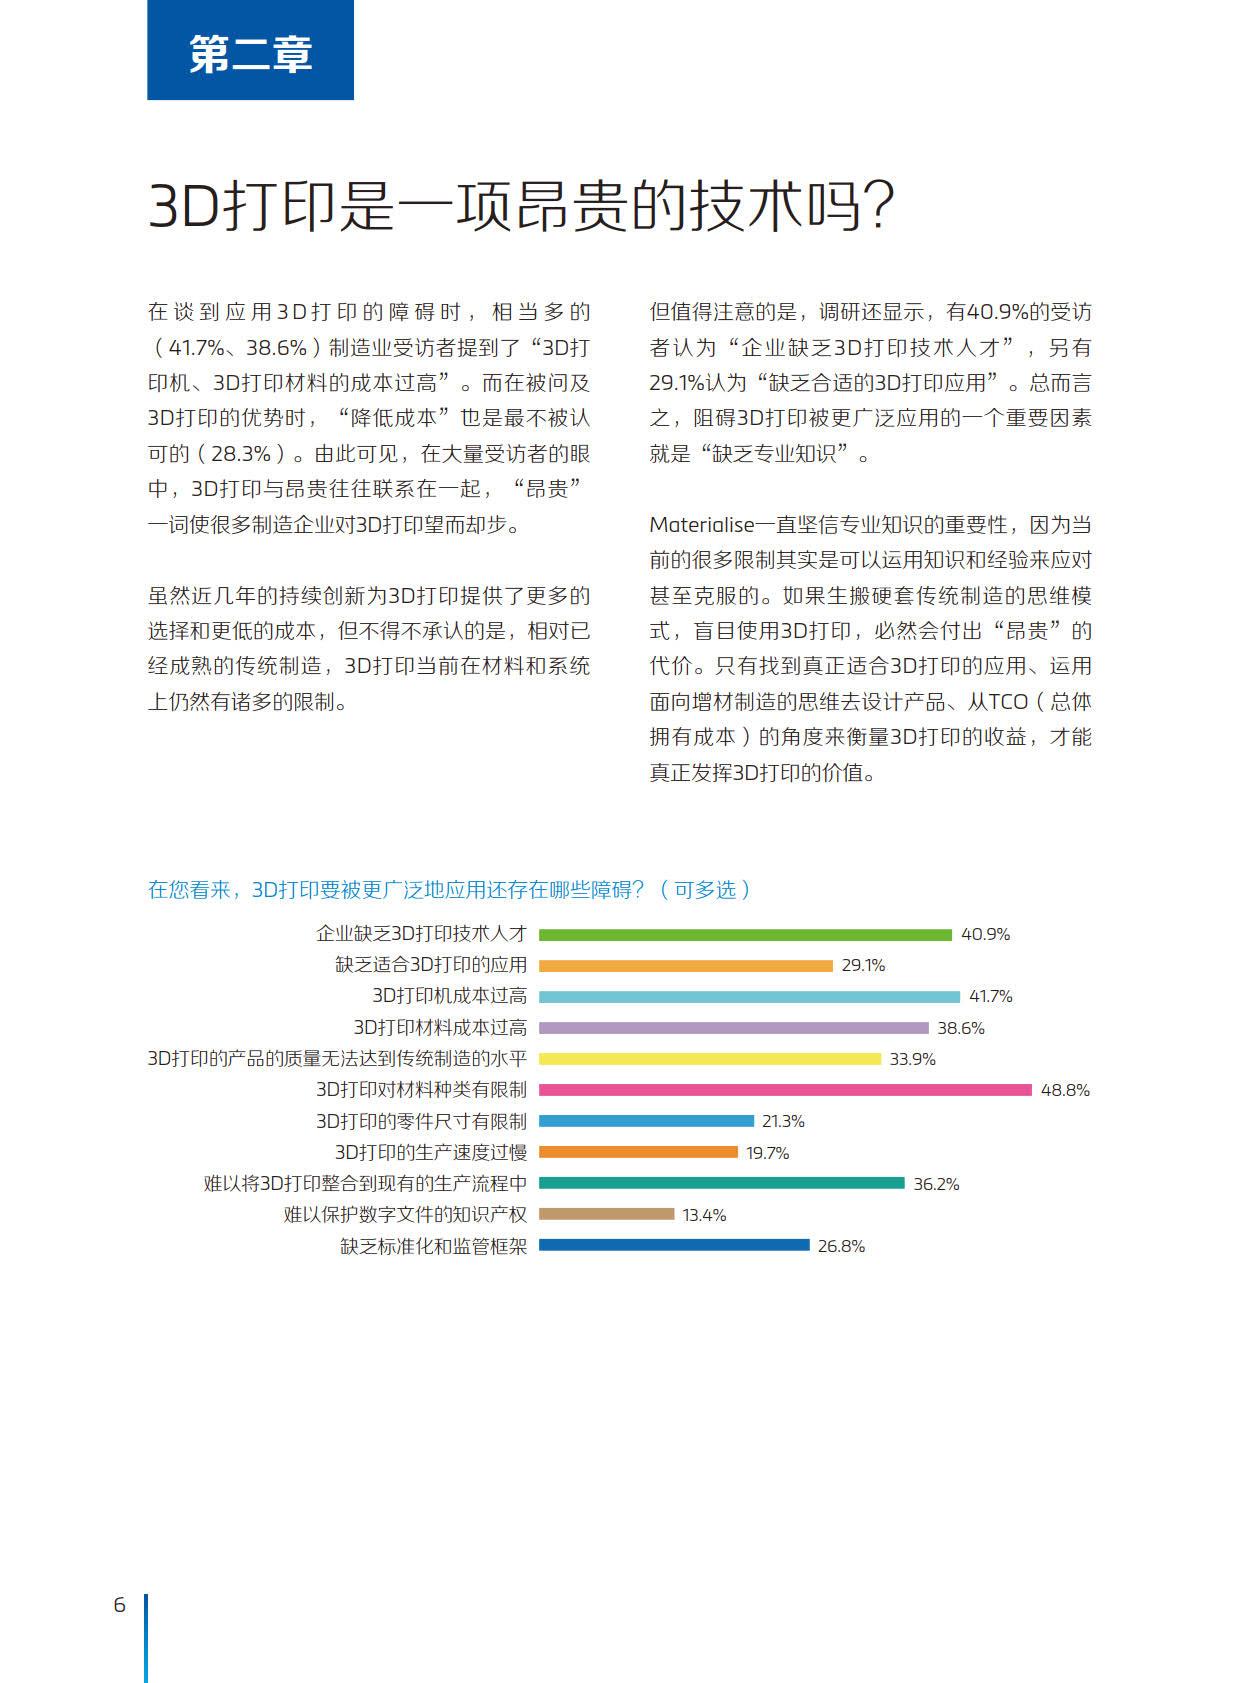 Materialise制造业调研报告_6.jpg